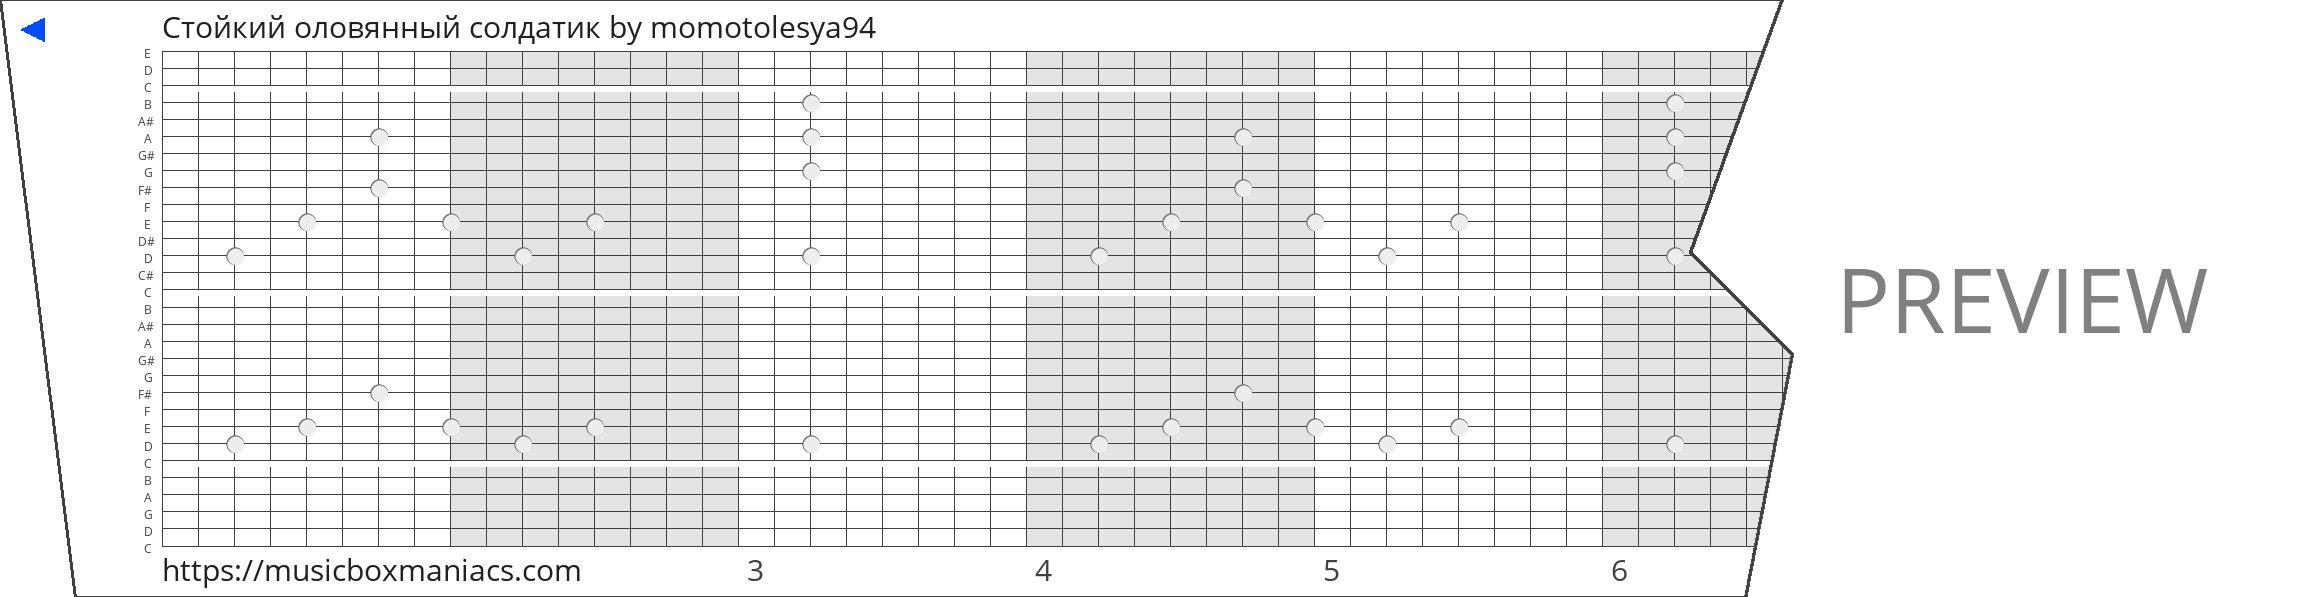 Стойкий оловянный солдатик 30 note music box paper strip